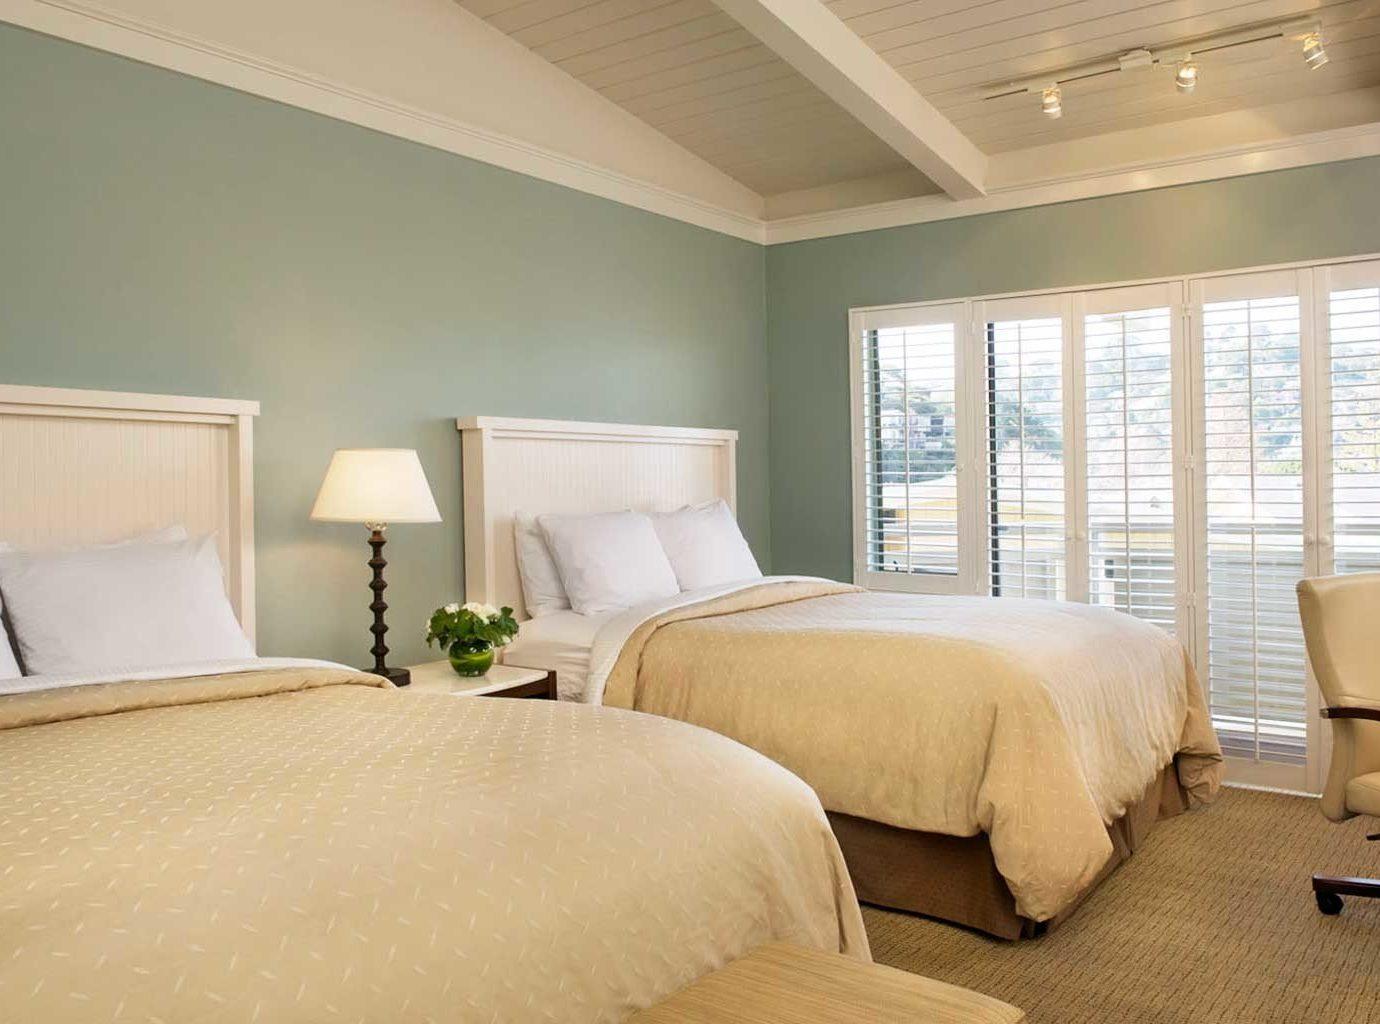 Balcony Bedroom Lodge Modern Scenic views sofa property Suite living room home condominium cottage